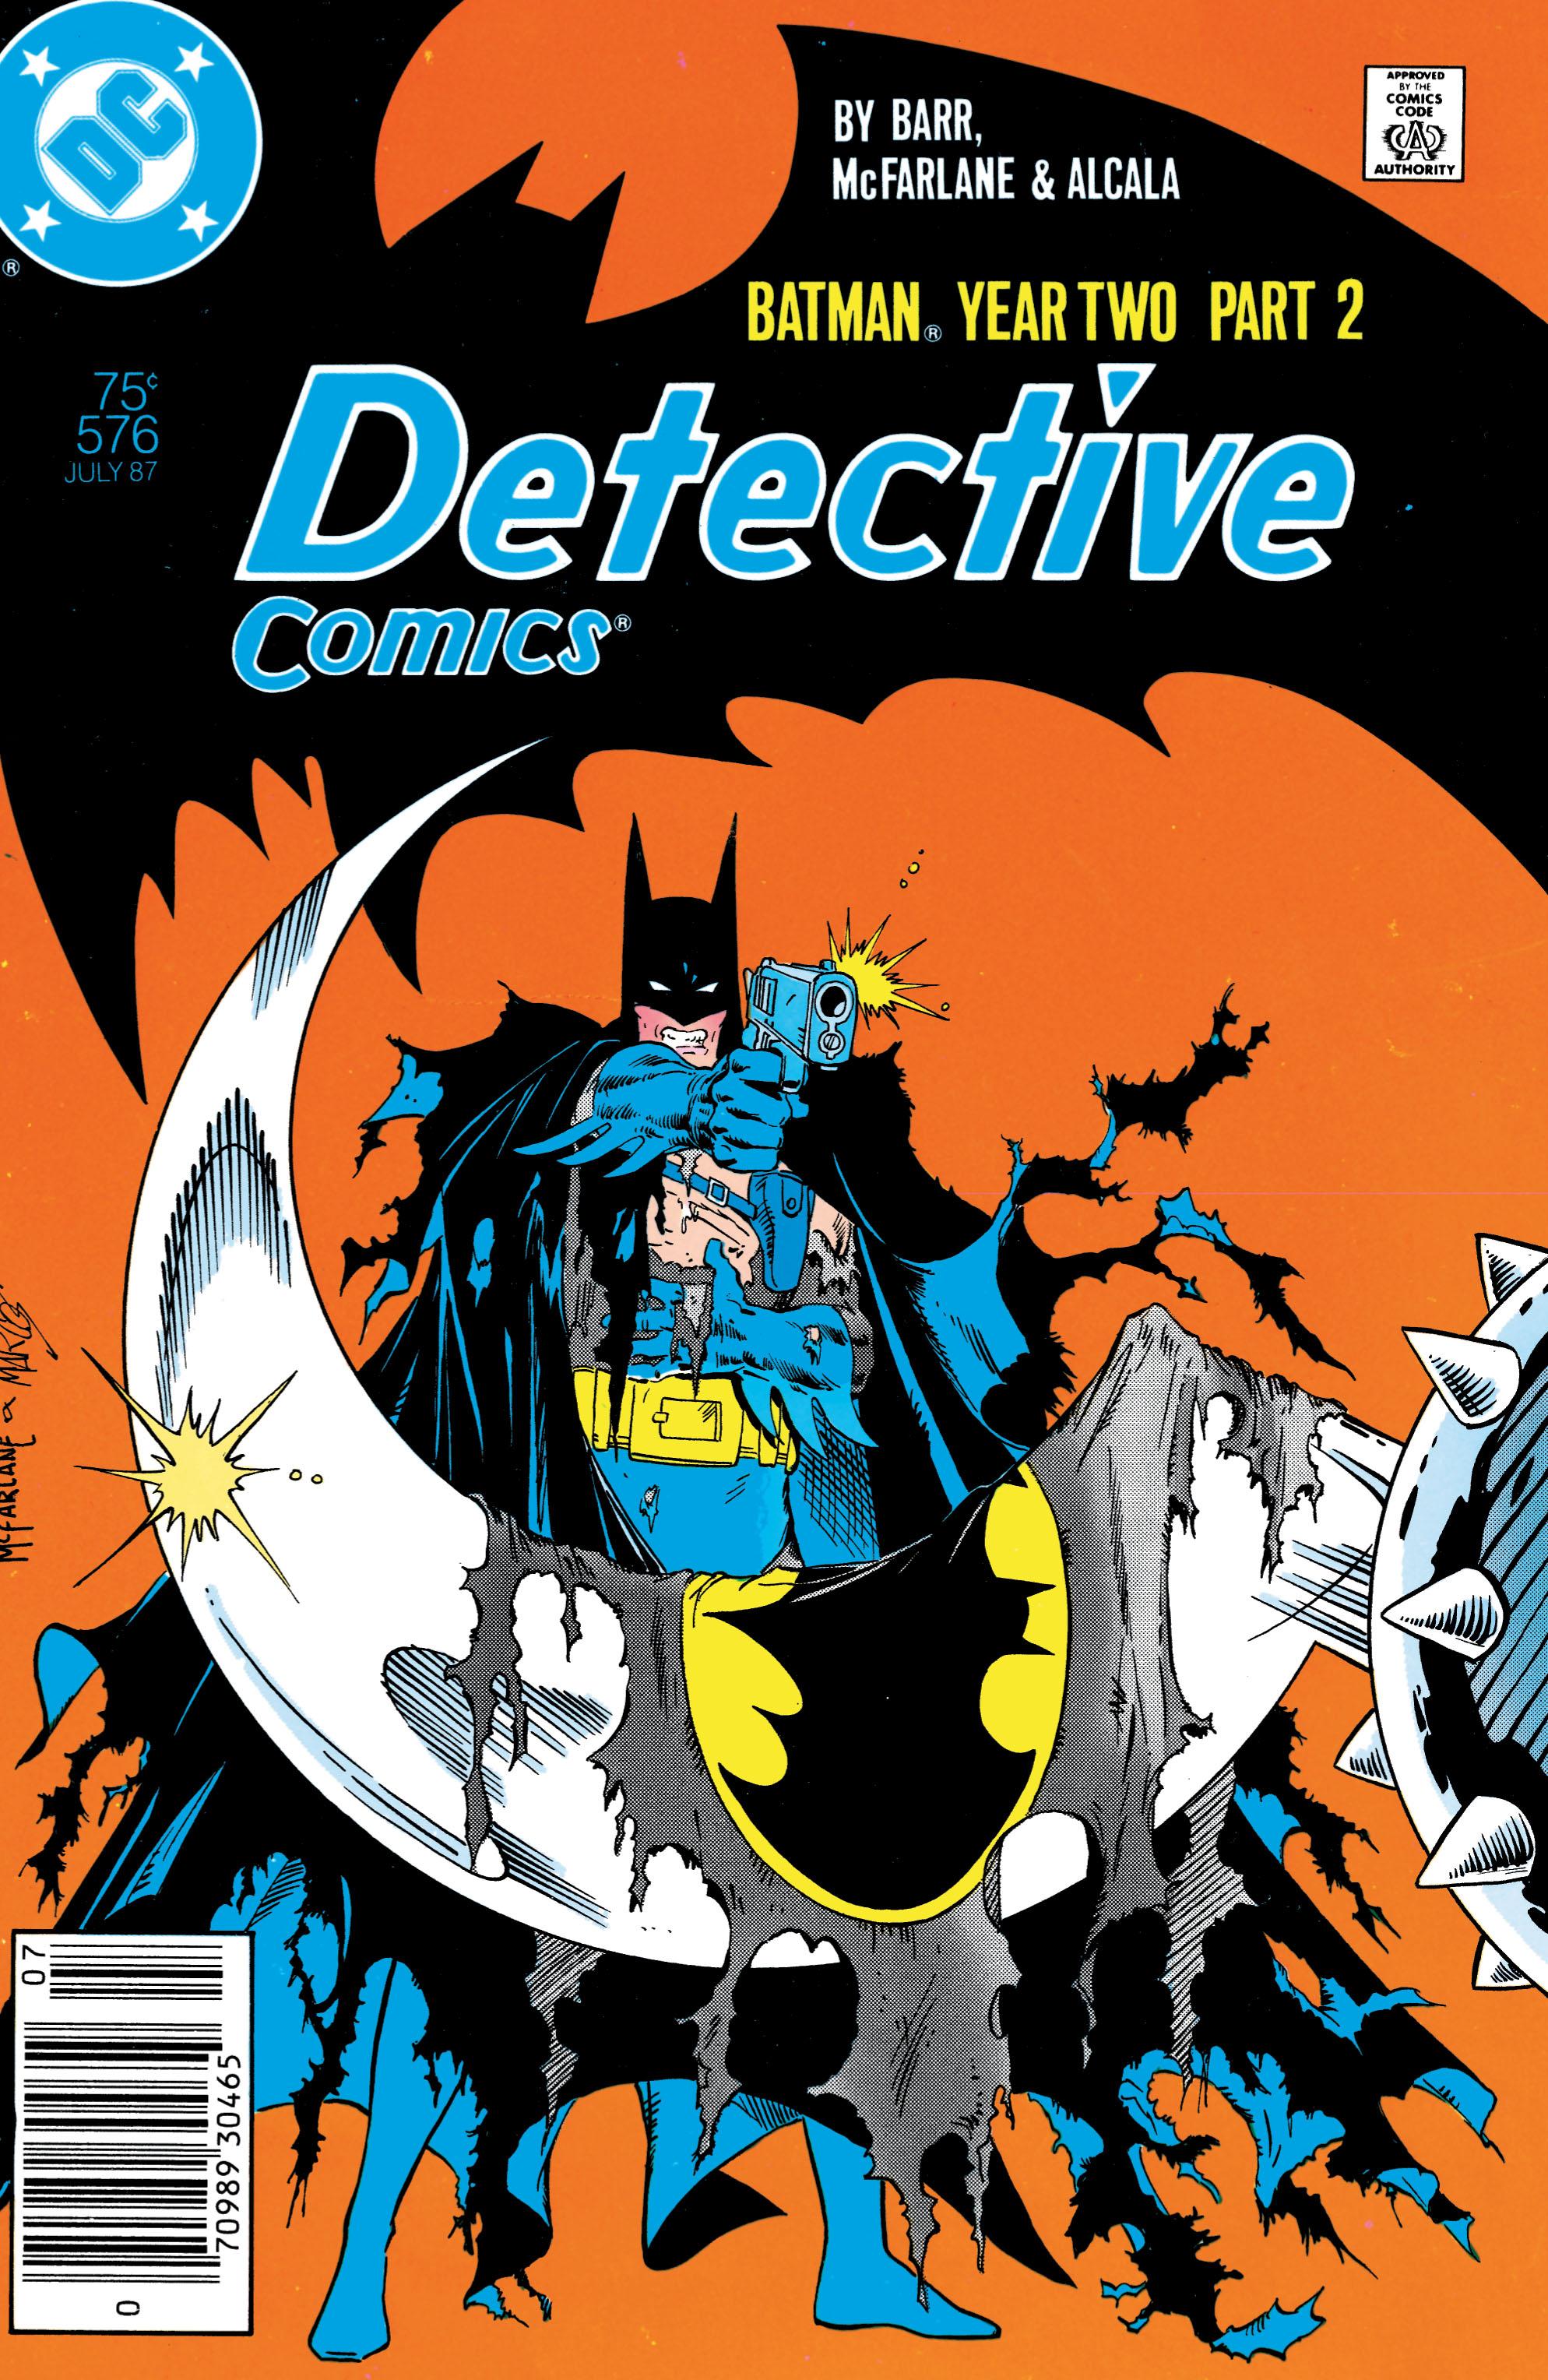 Detective Comics (1937) 576 Page 1